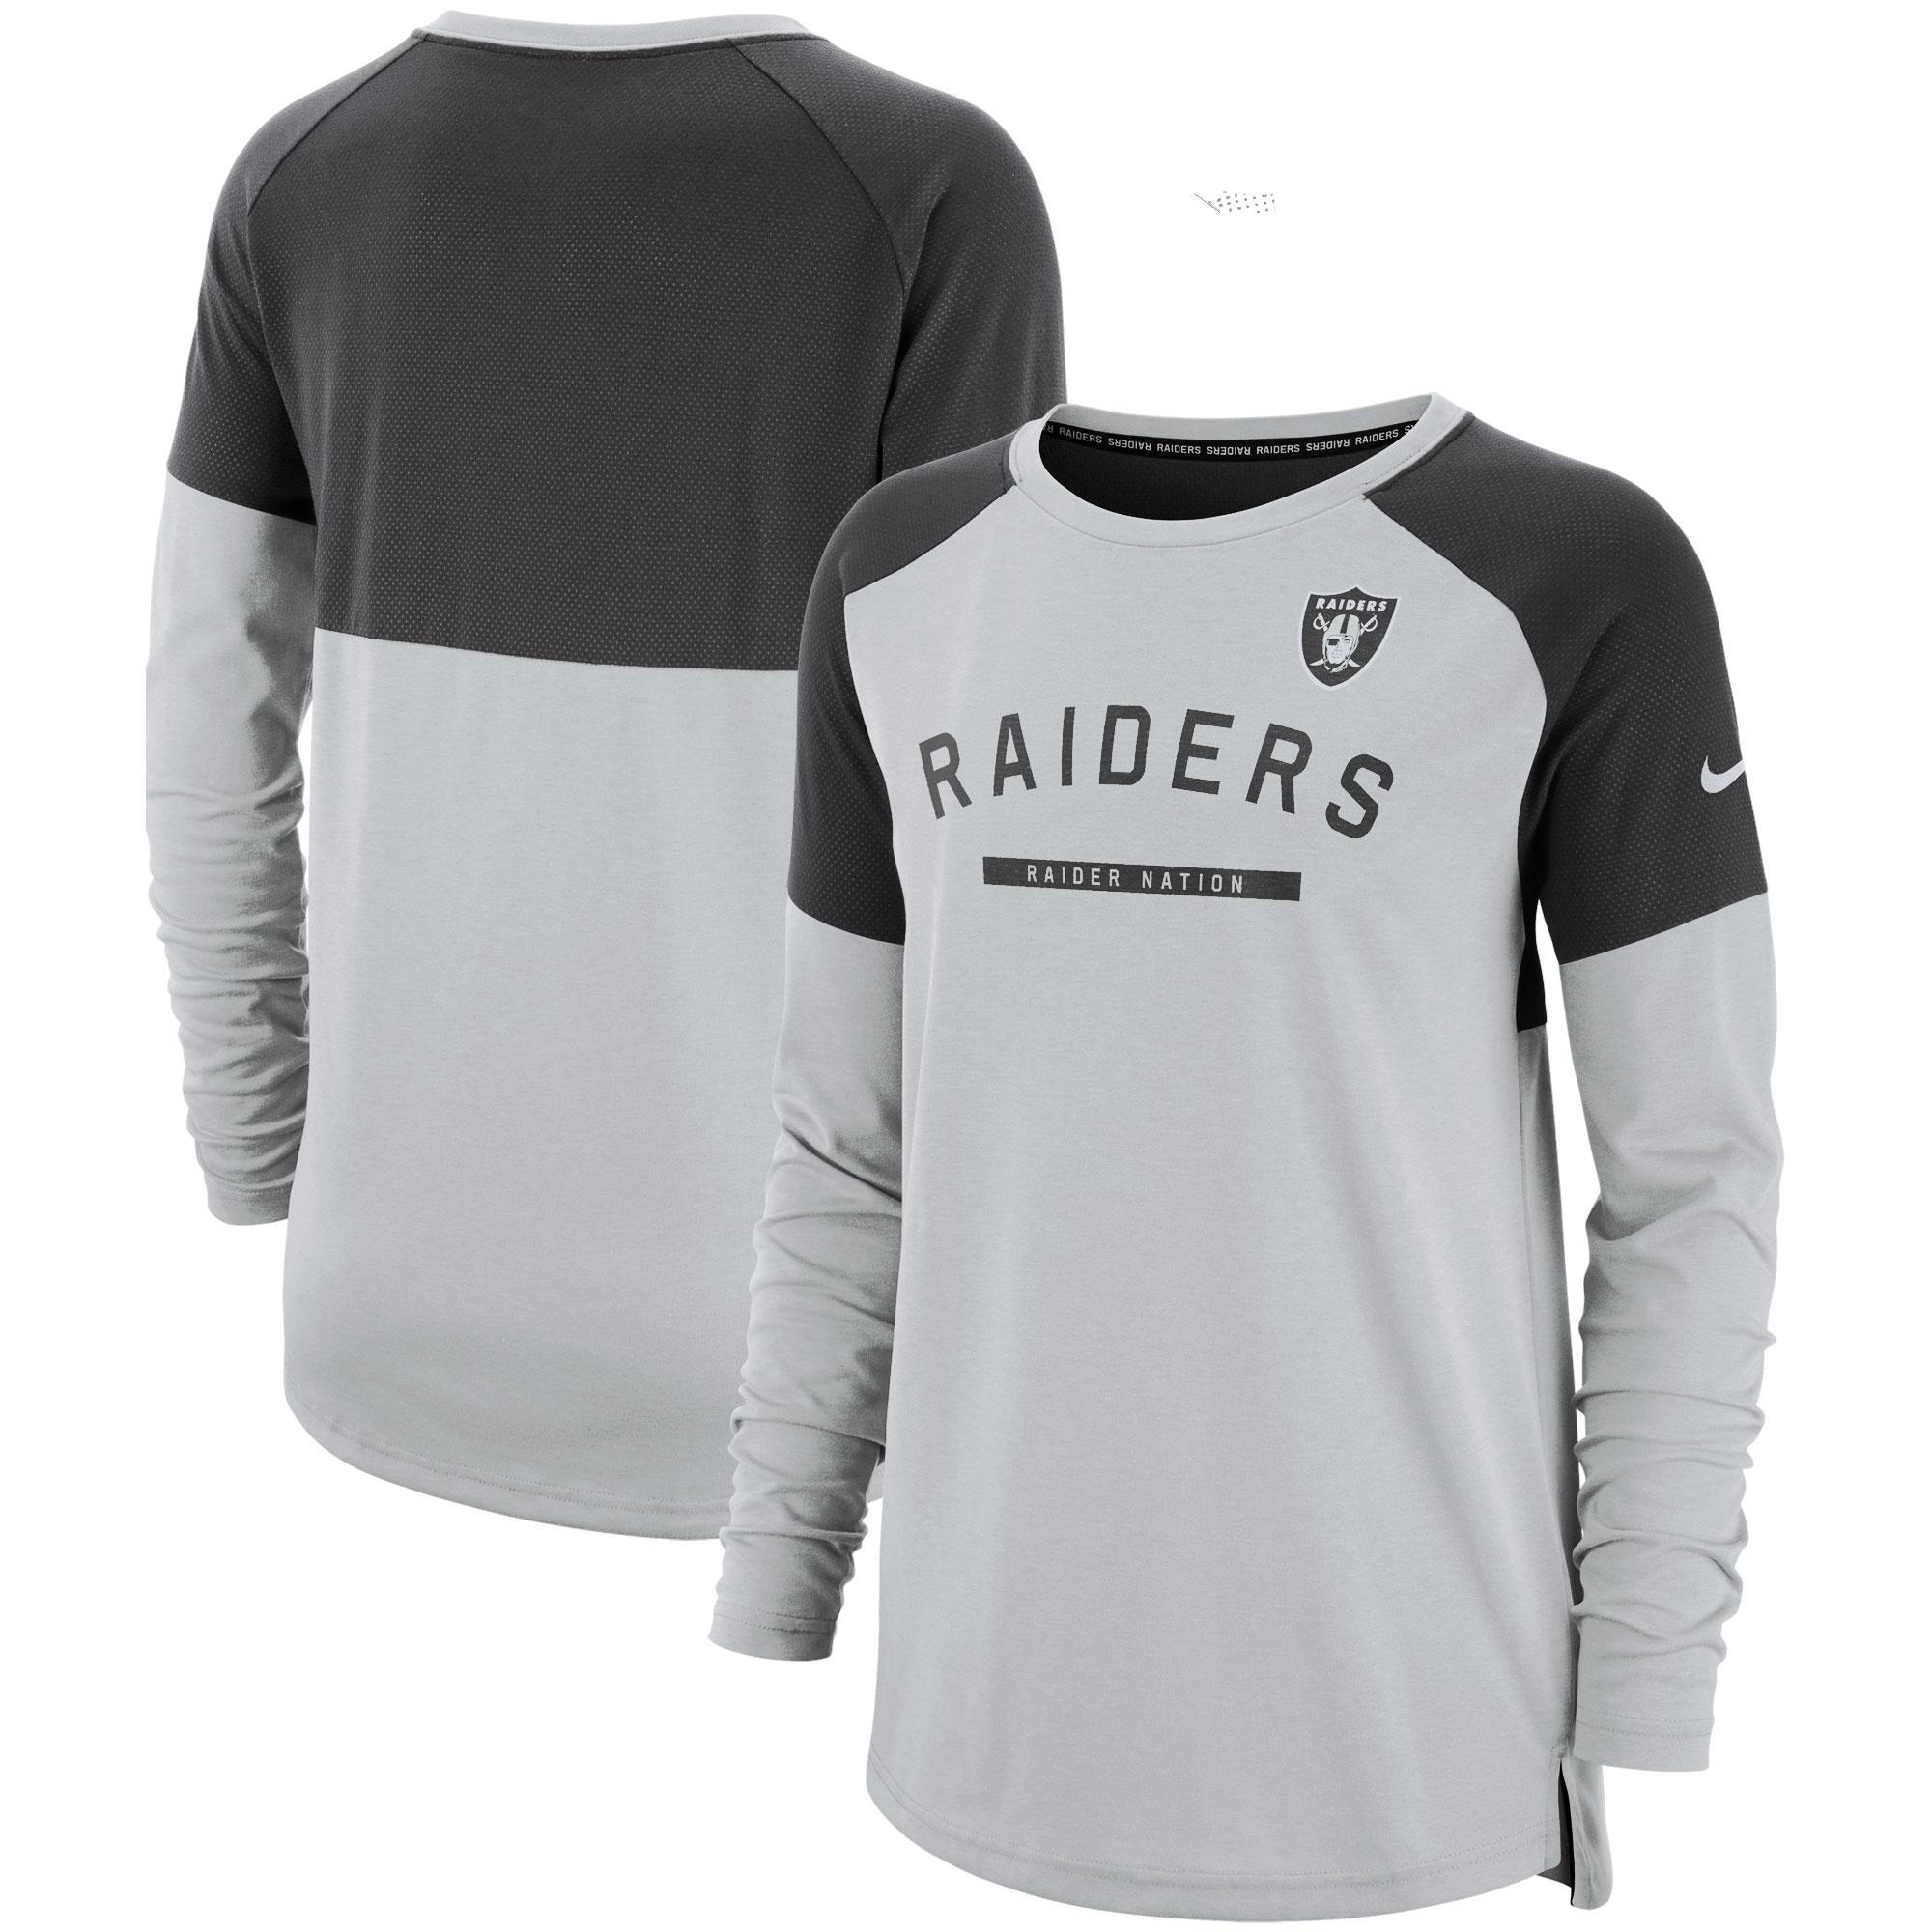 Oakland Raiders Nike Women's Tailgate Long-Sleeve T-Shirt - Gray